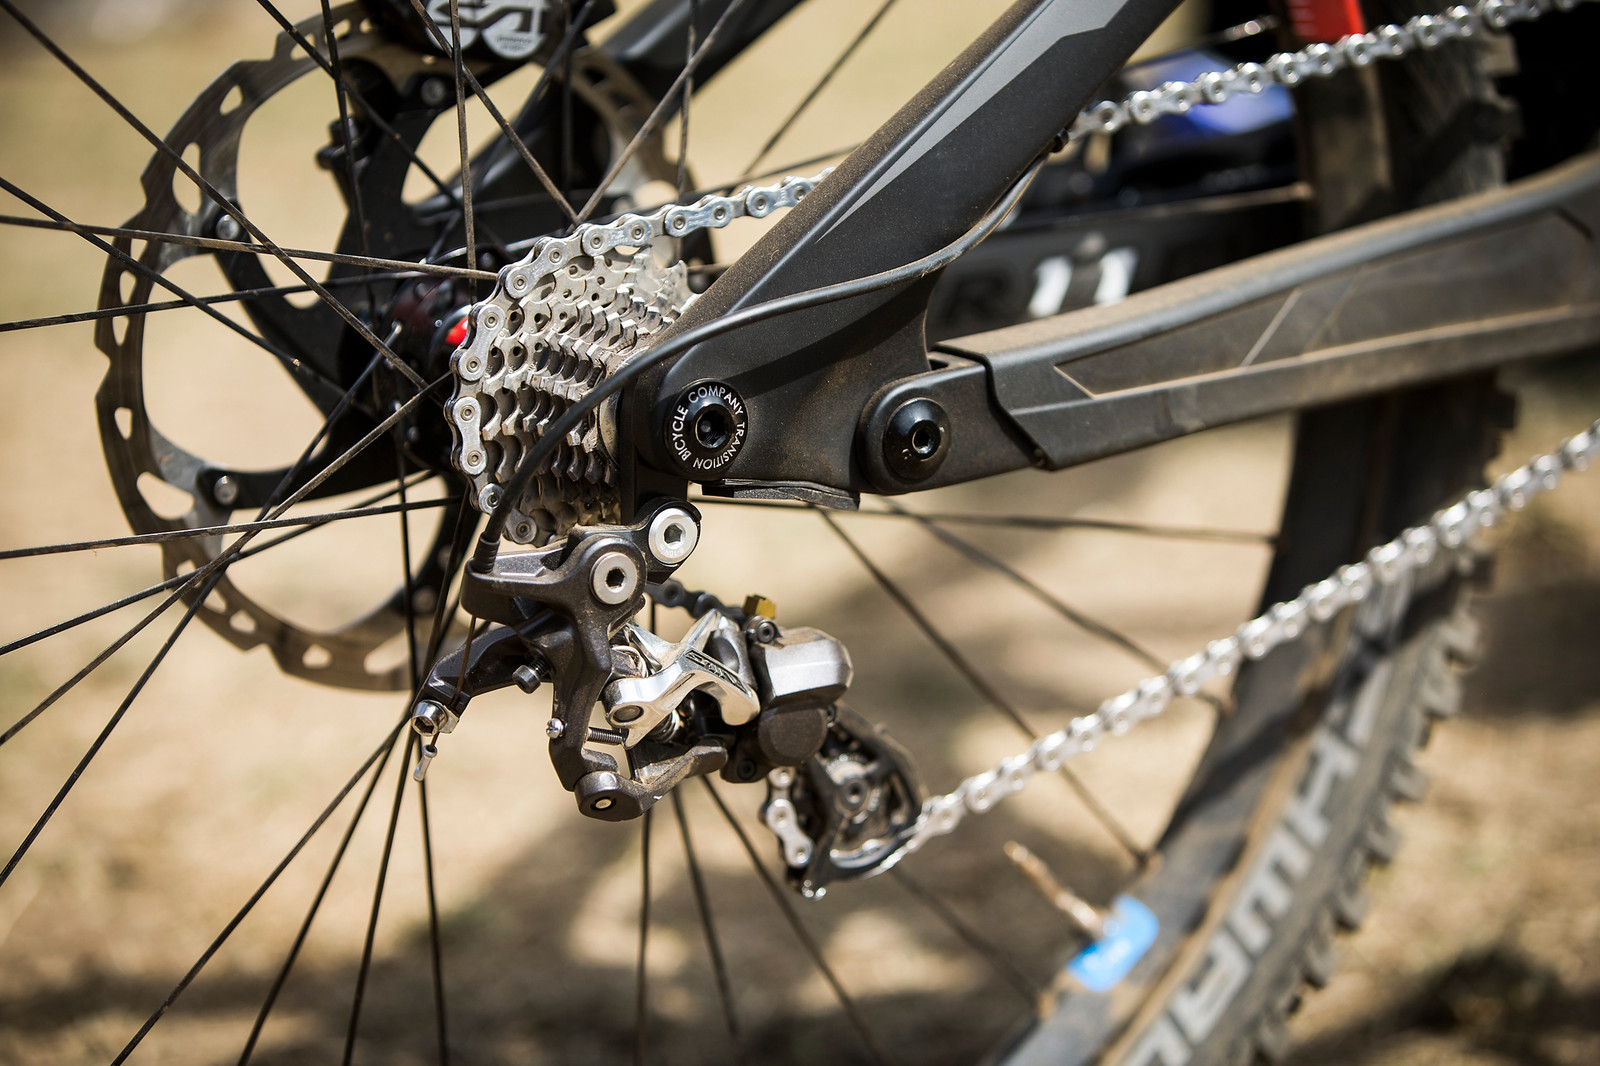 Shimano Saint Rear Derailleur - WINNING BIKE: Tahnee Seagrave's Transition TR11 - Mountain Biking Pictures - Vital MTB